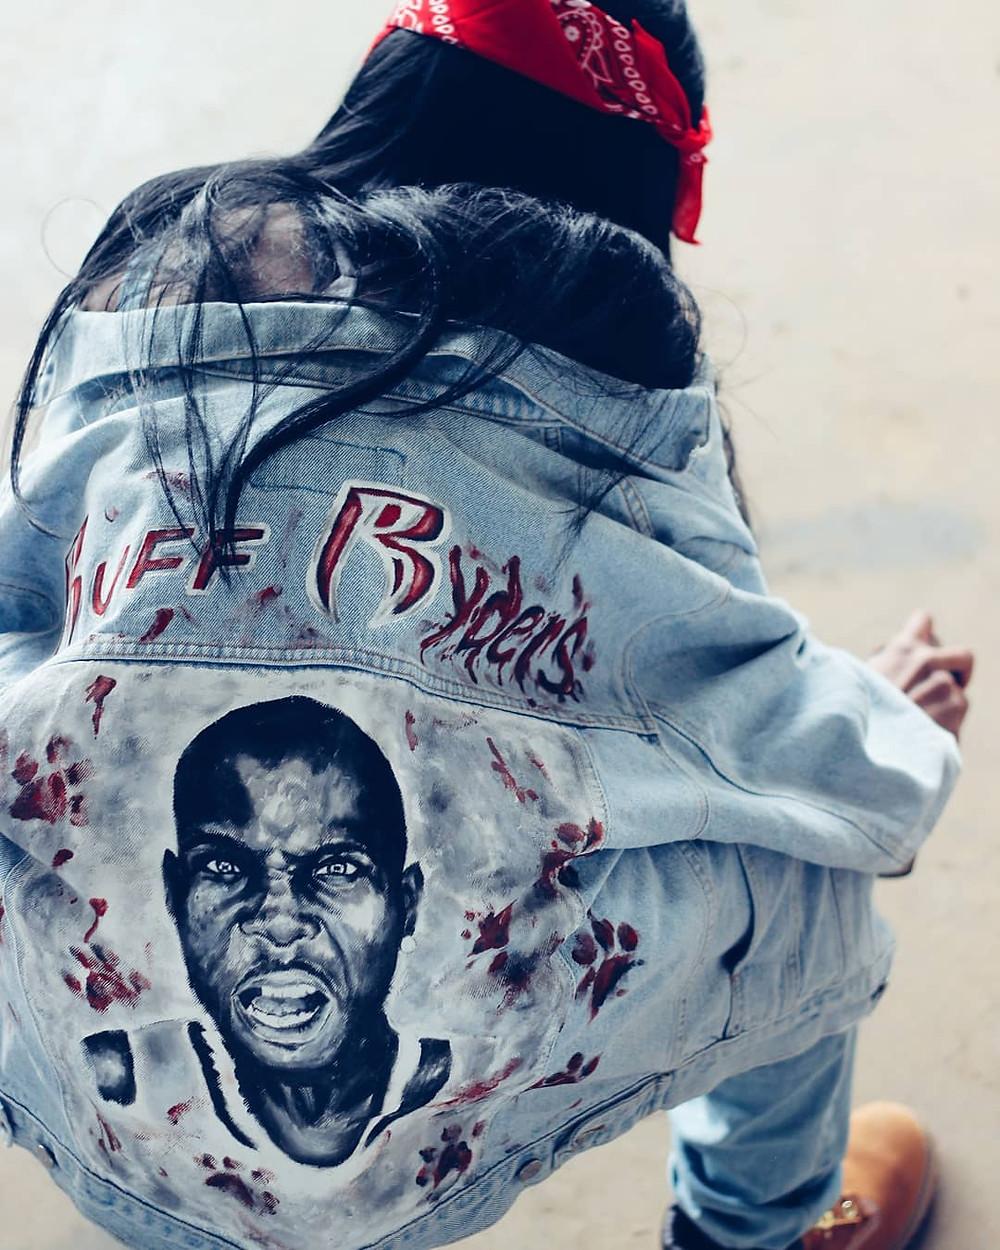 Ruff Ryders customized jacket